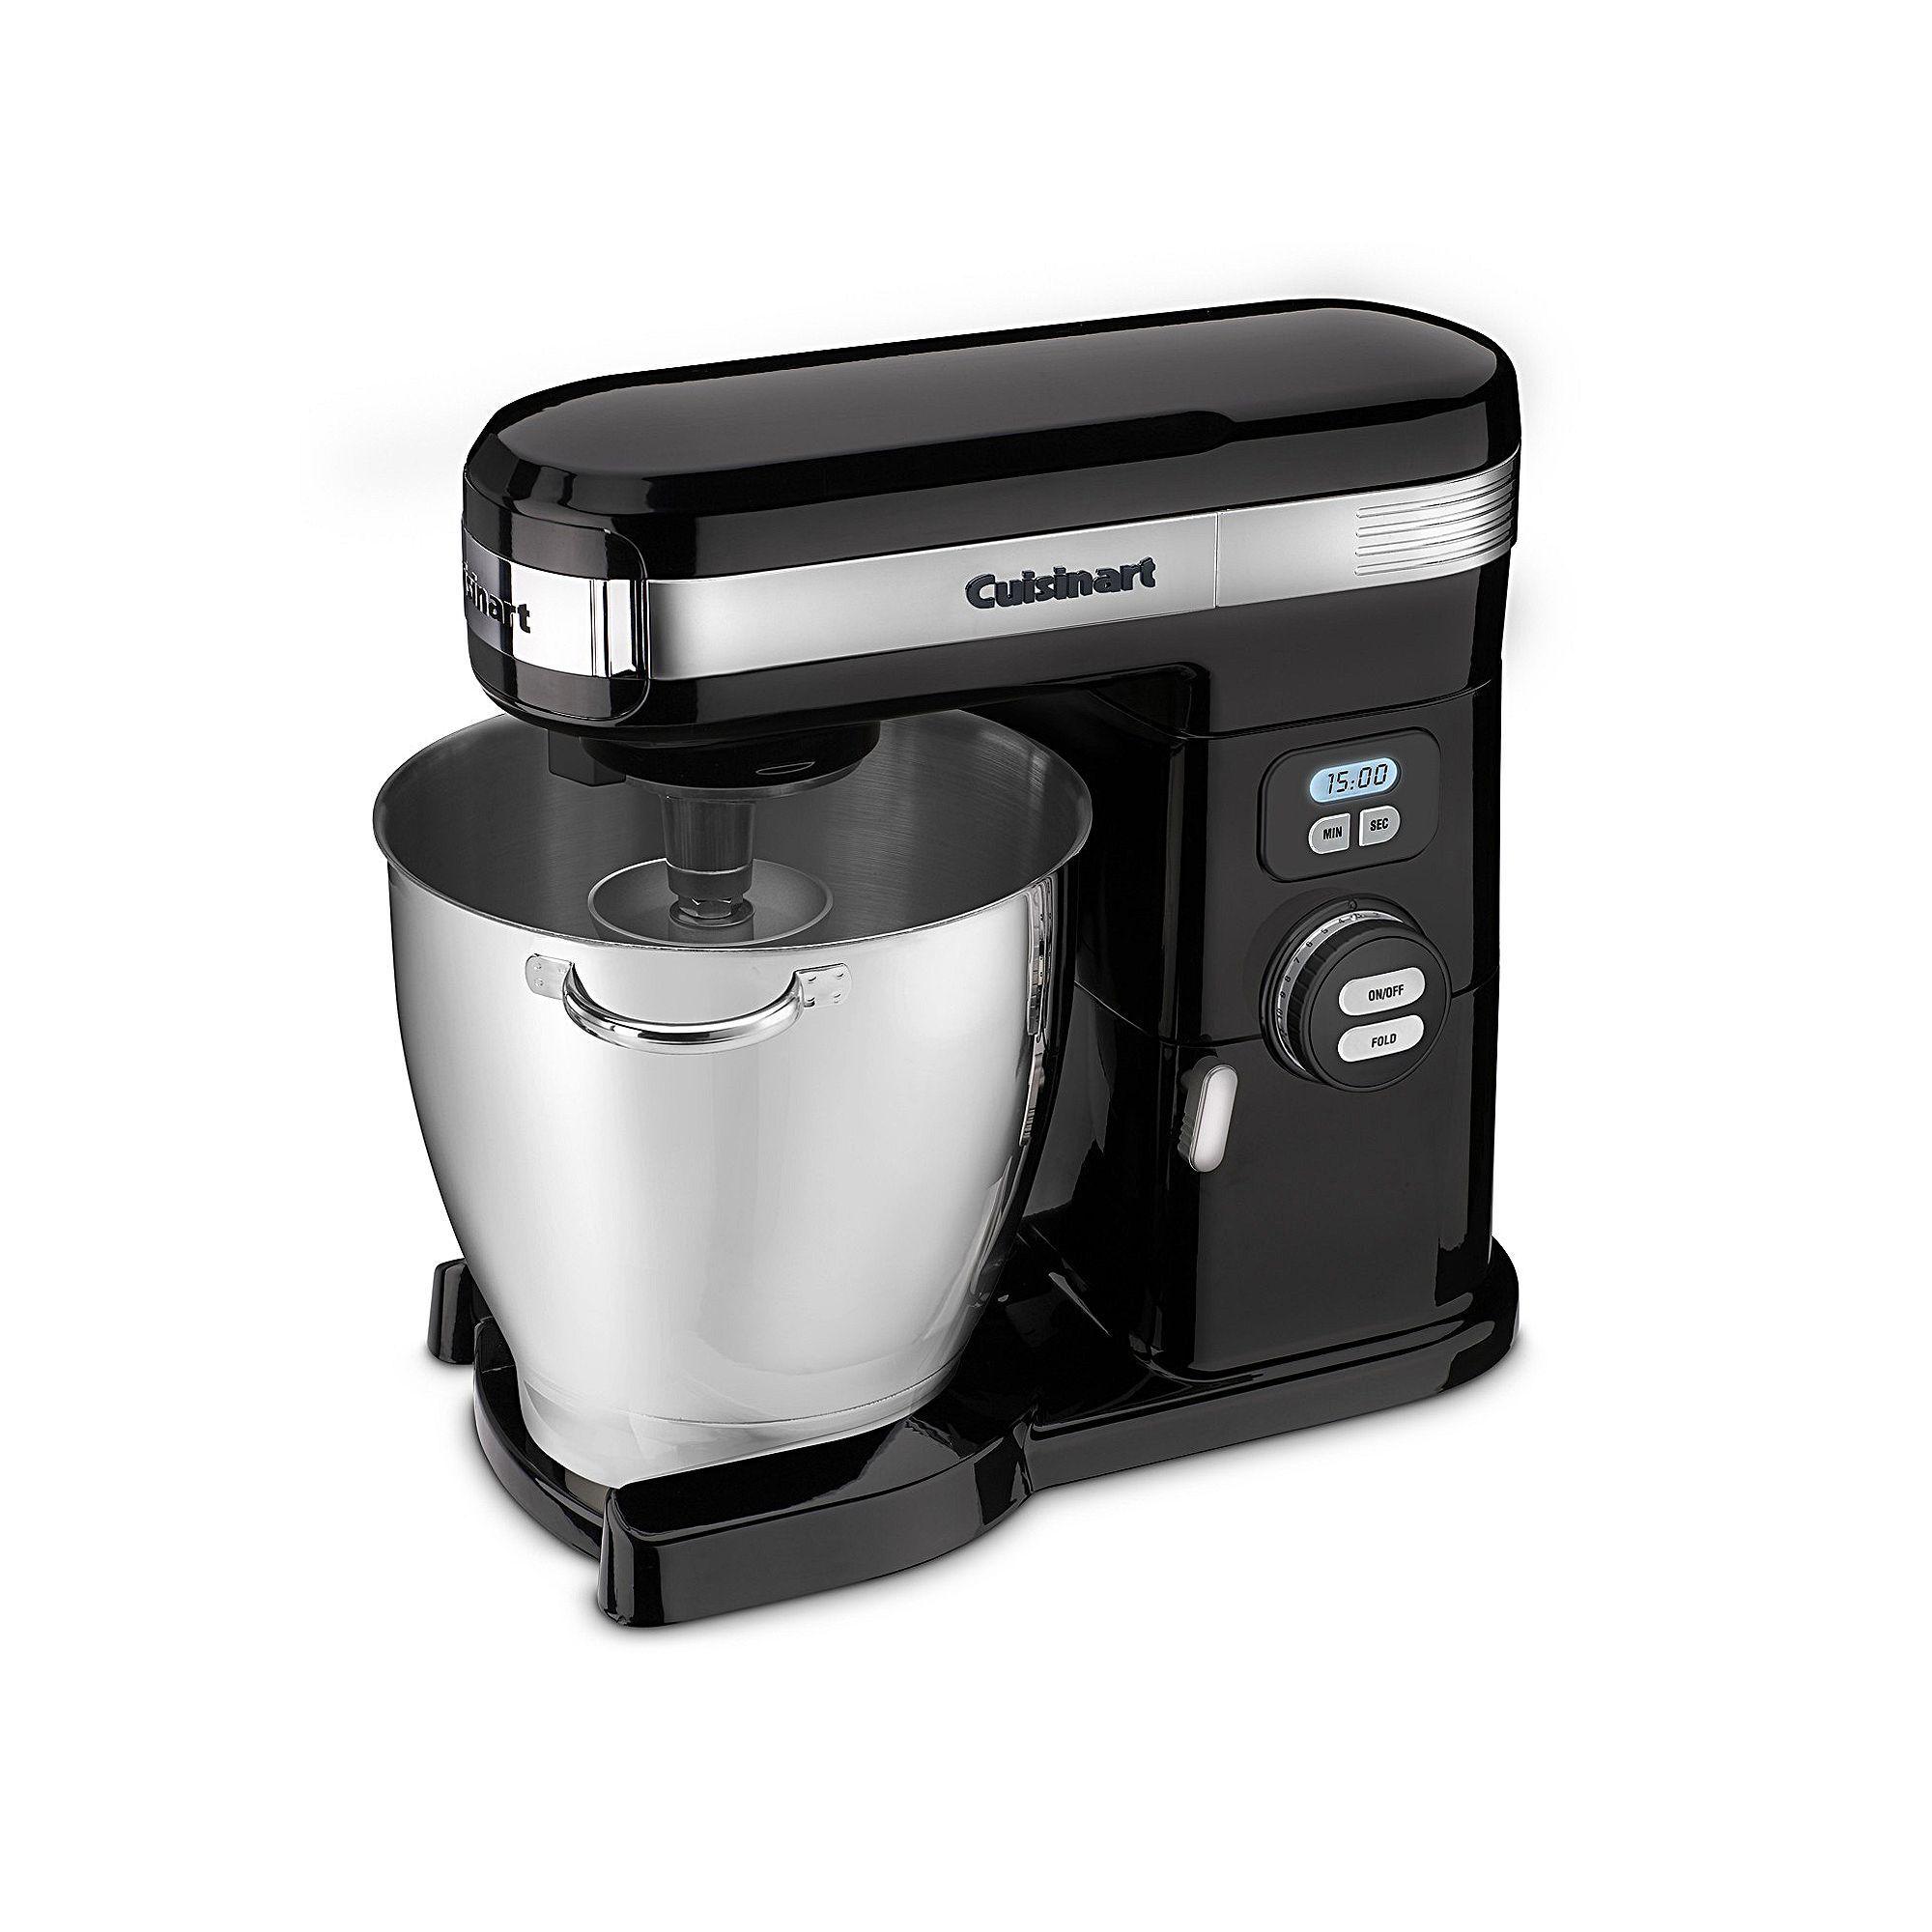 Cuisinart 7qt stand mixer kitchen stand mixers best